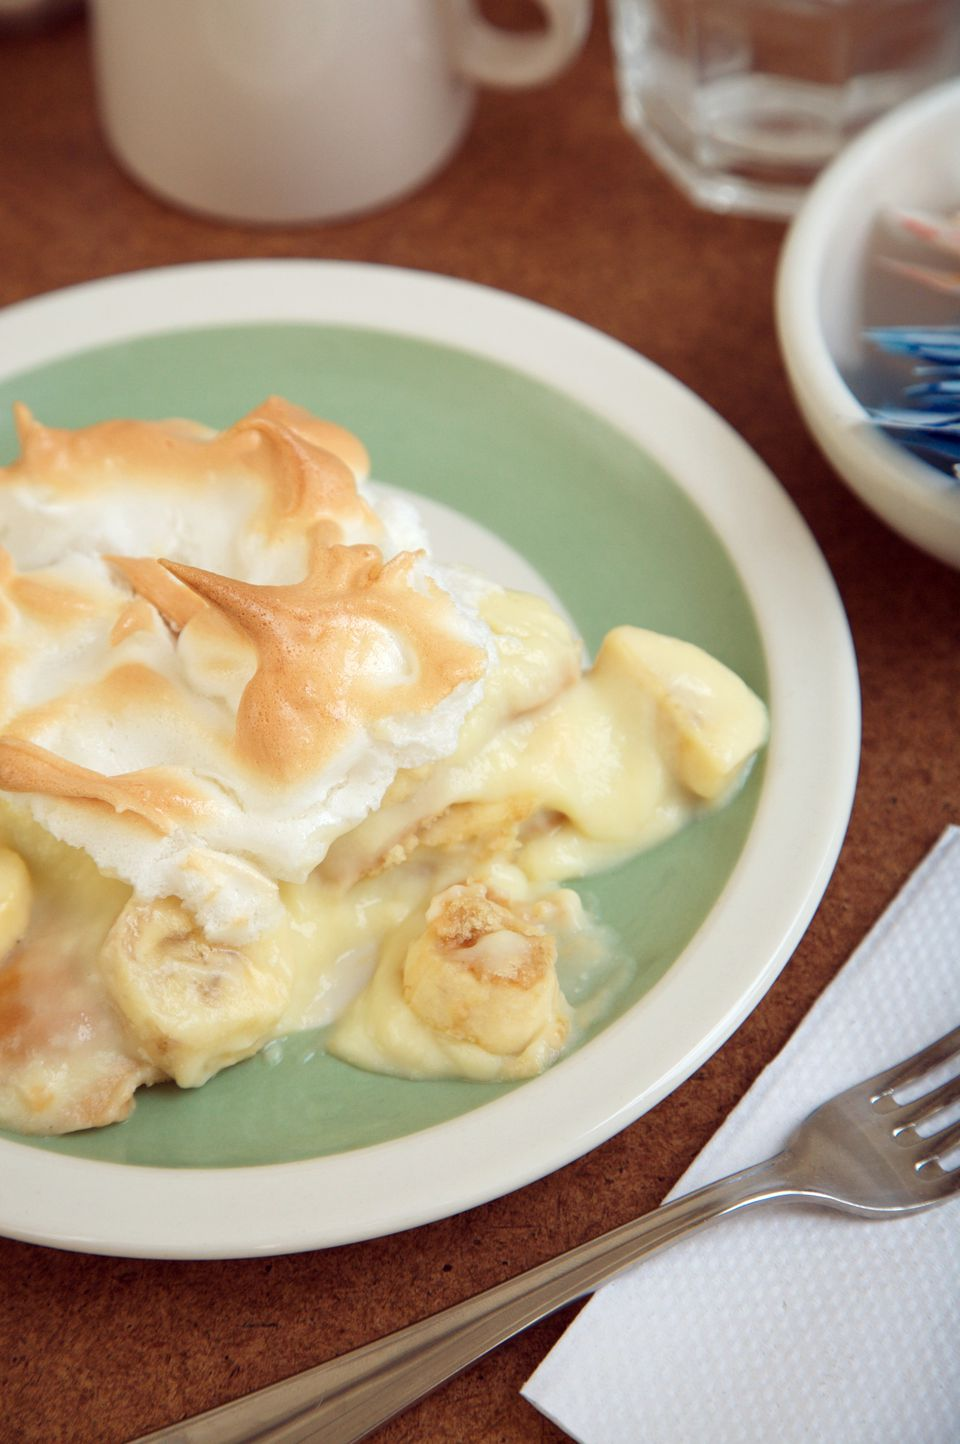 Baked Banana Pudding with Meringue